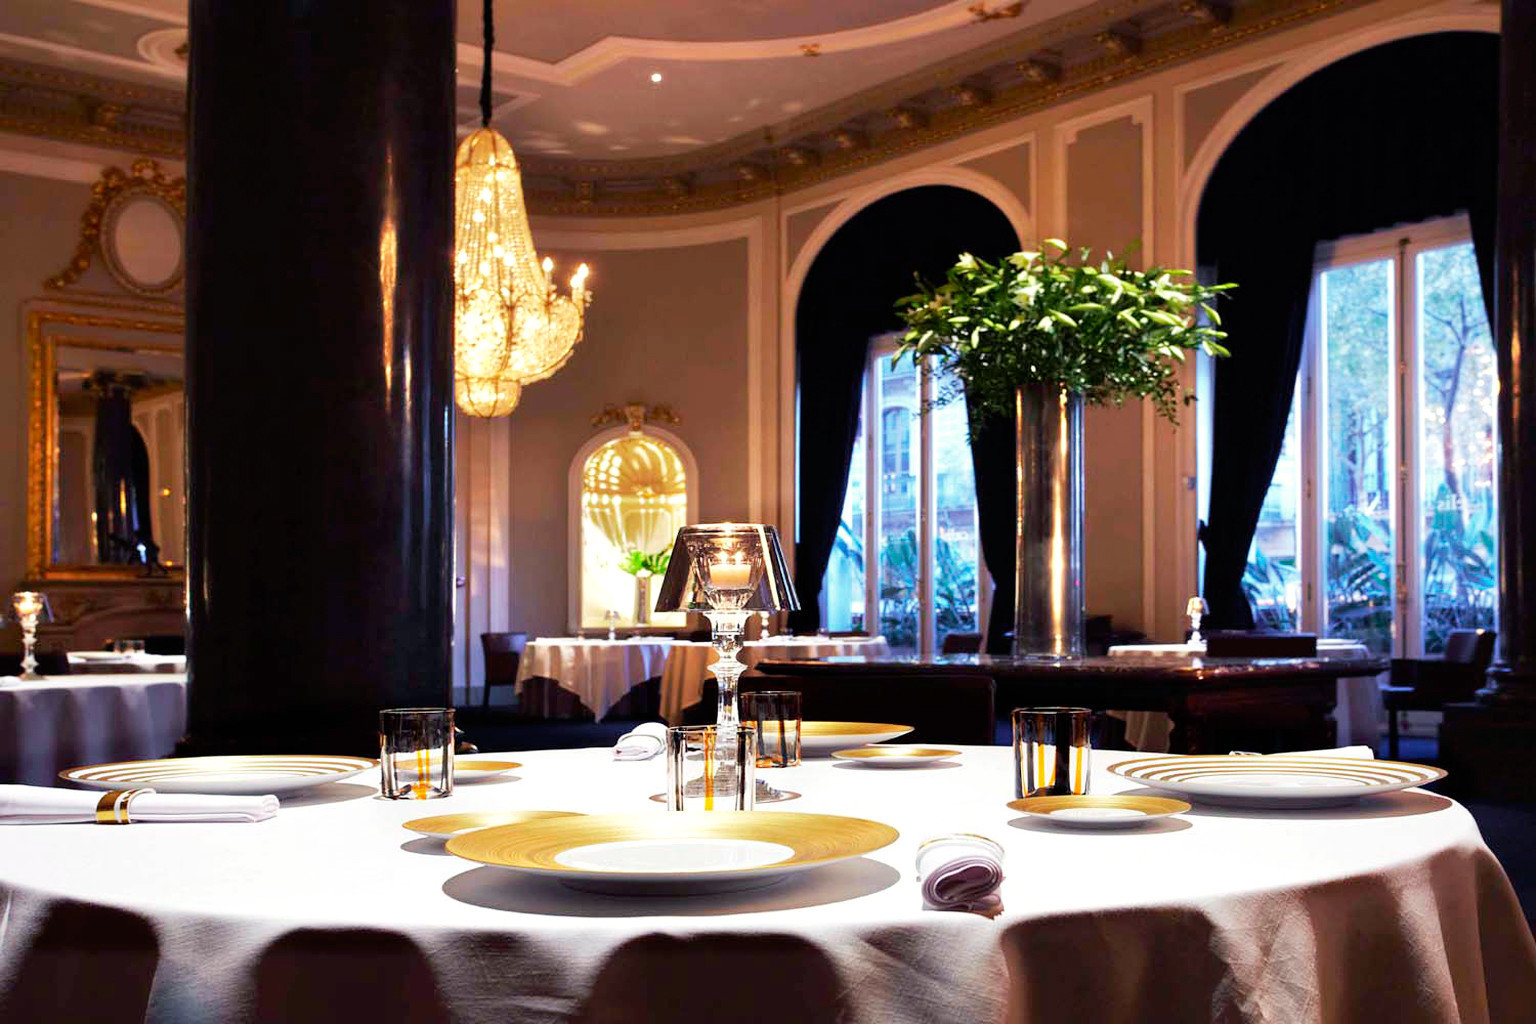 City Classic Dining Drink Eat Elegant Luxury Romantic restaurant function hall Lobby Resort ballroom living room fancy dining table